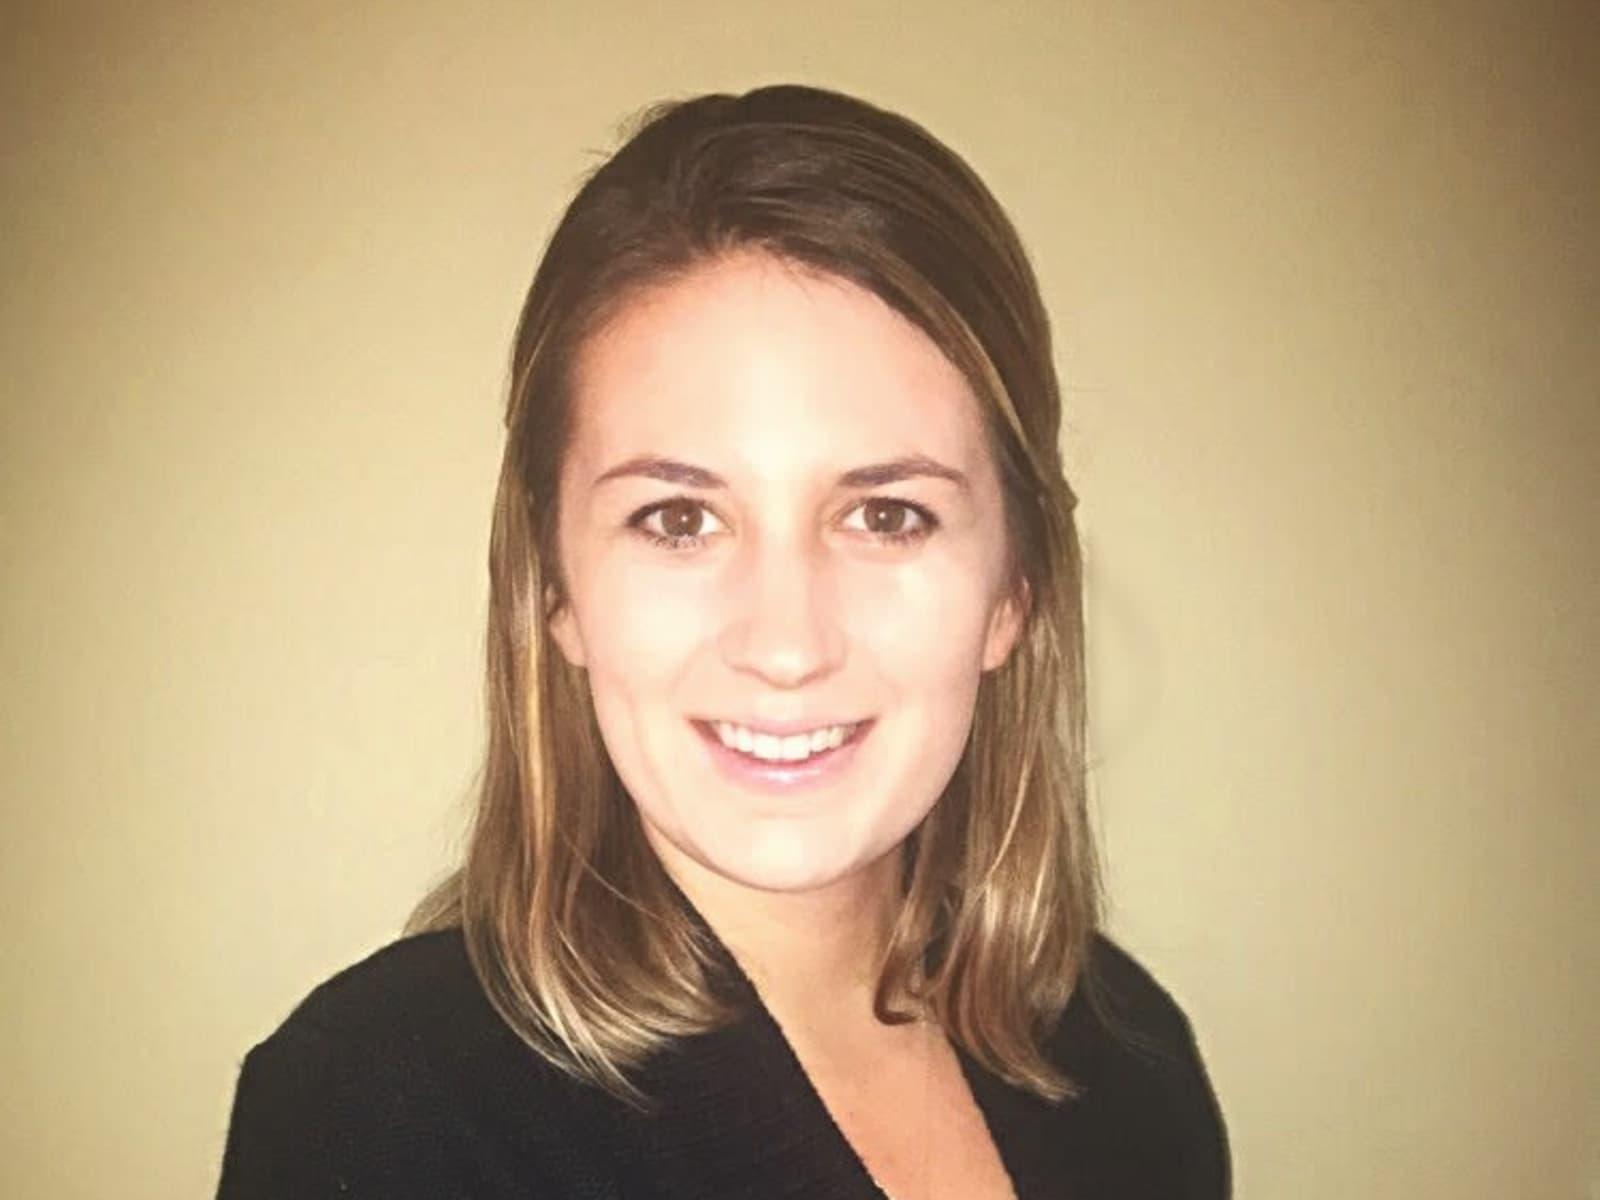 Kelsey from Greater Sudbury, Ontario, Canada